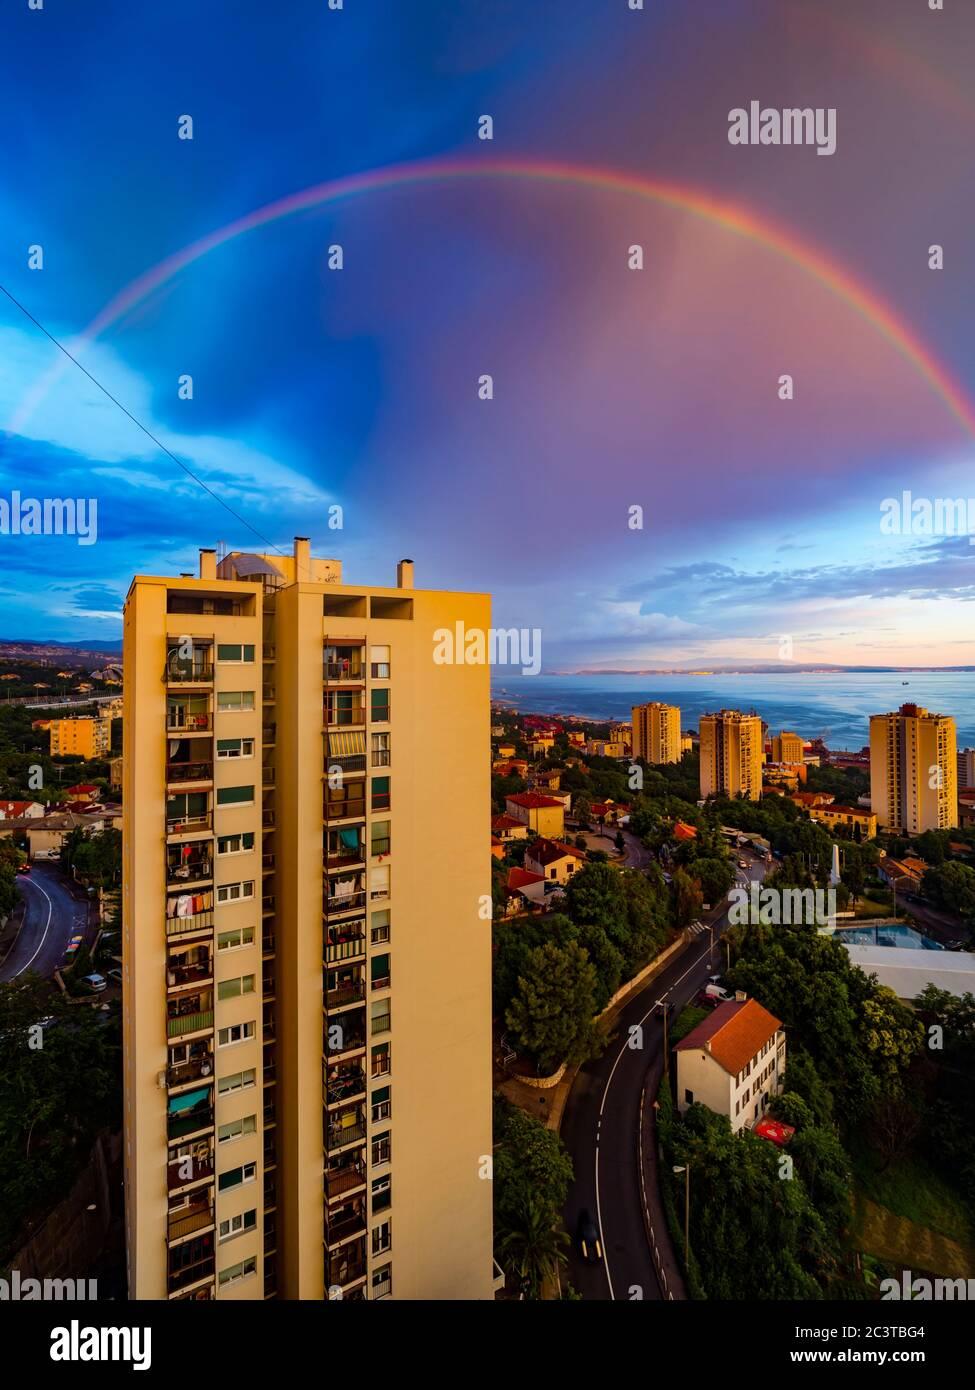 Evening full arc arch rainbow above skyscraper house building Stock Photo